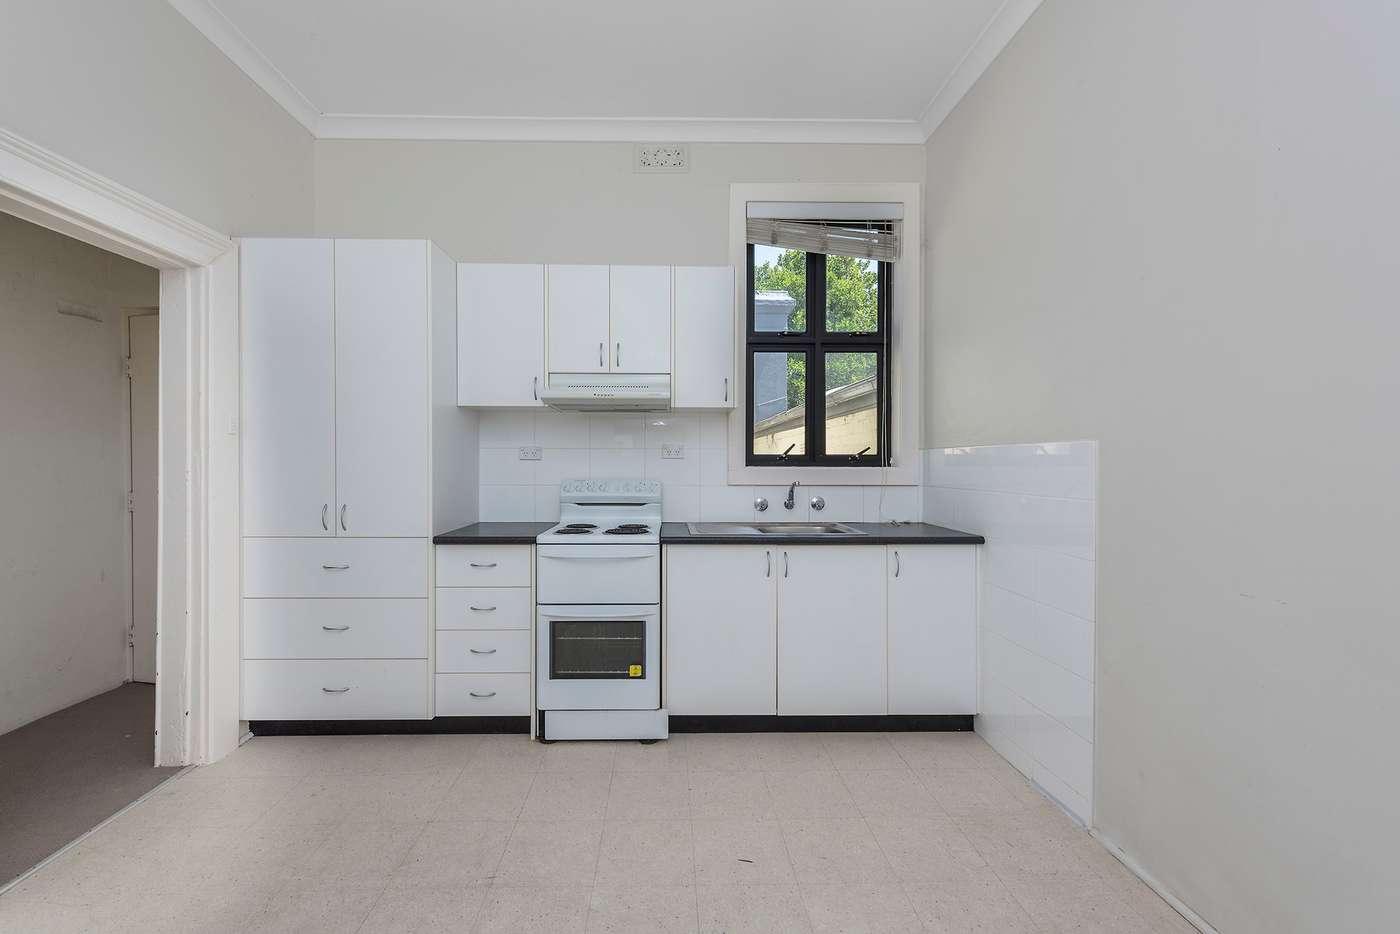 Main view of Homely studio listing, 4/35 Womerah Avenue, Darlinghurst NSW 2010